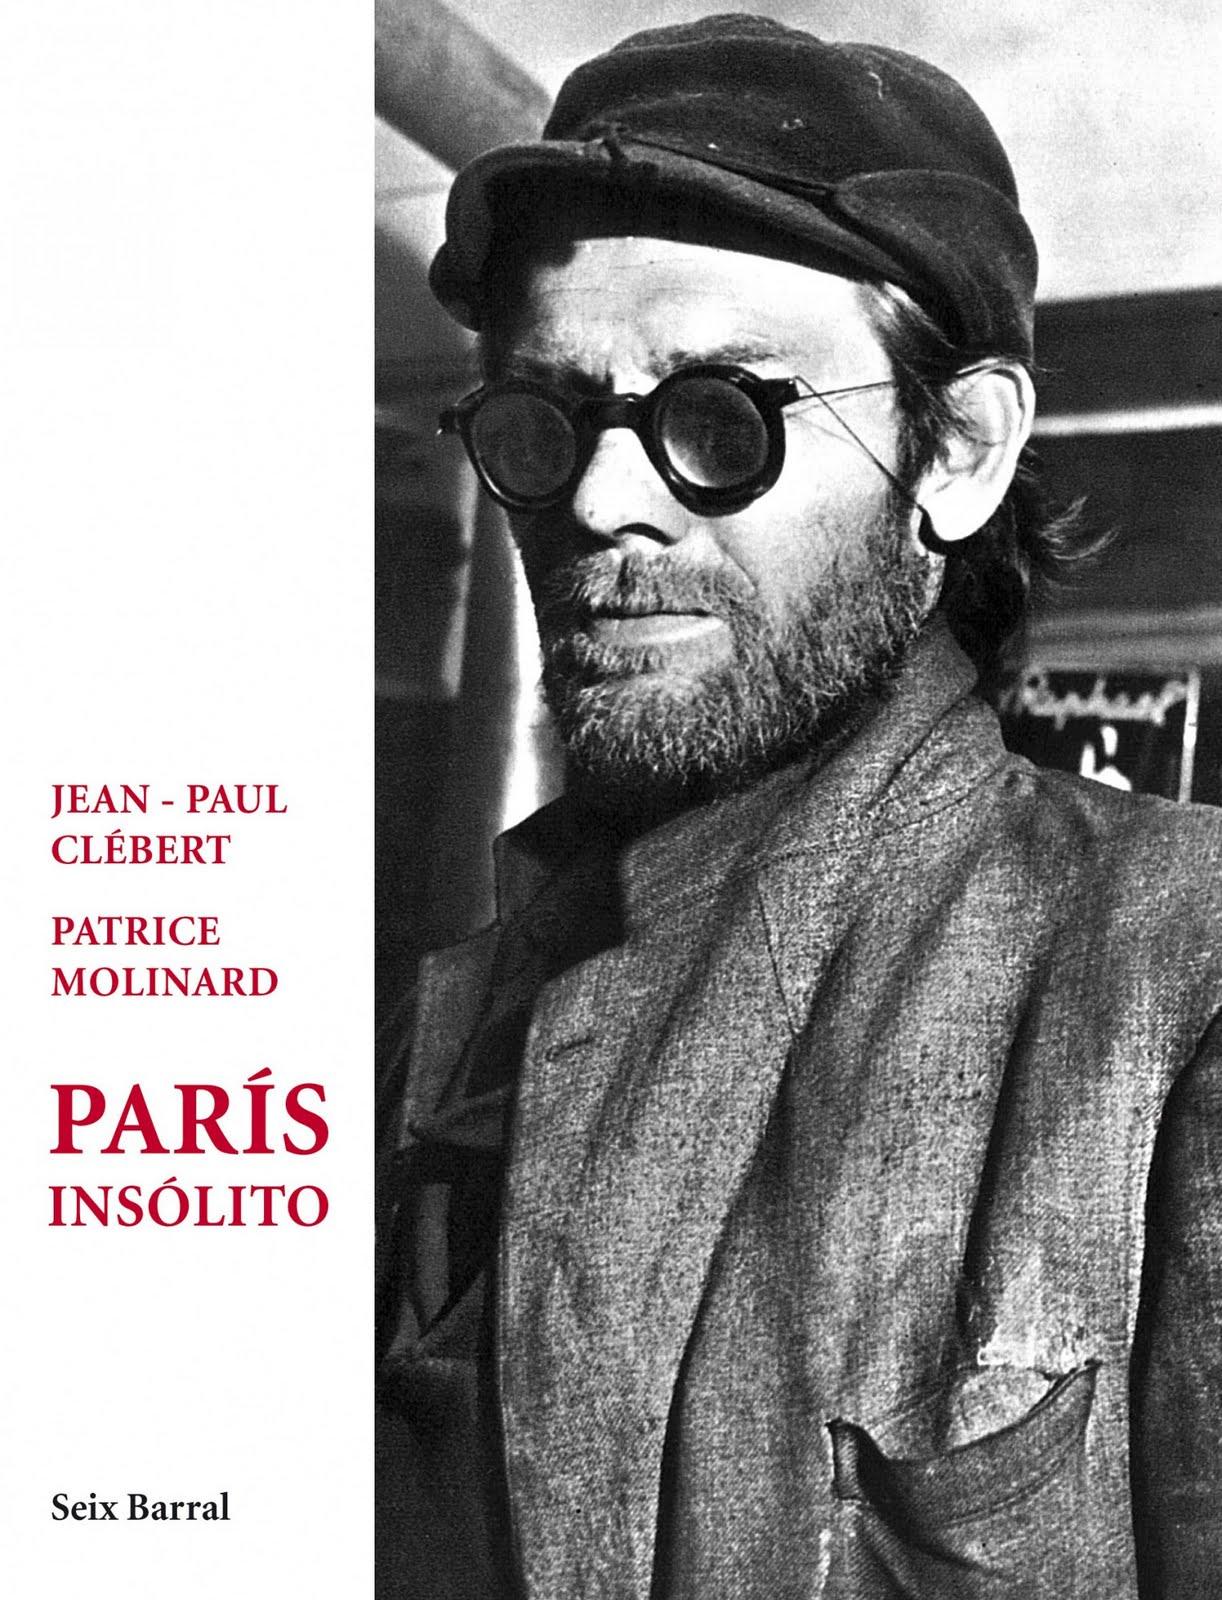 Viajad Viajad malditos- viajes- blog de viajes-viajar-París insólito- Jean Paul Clebert